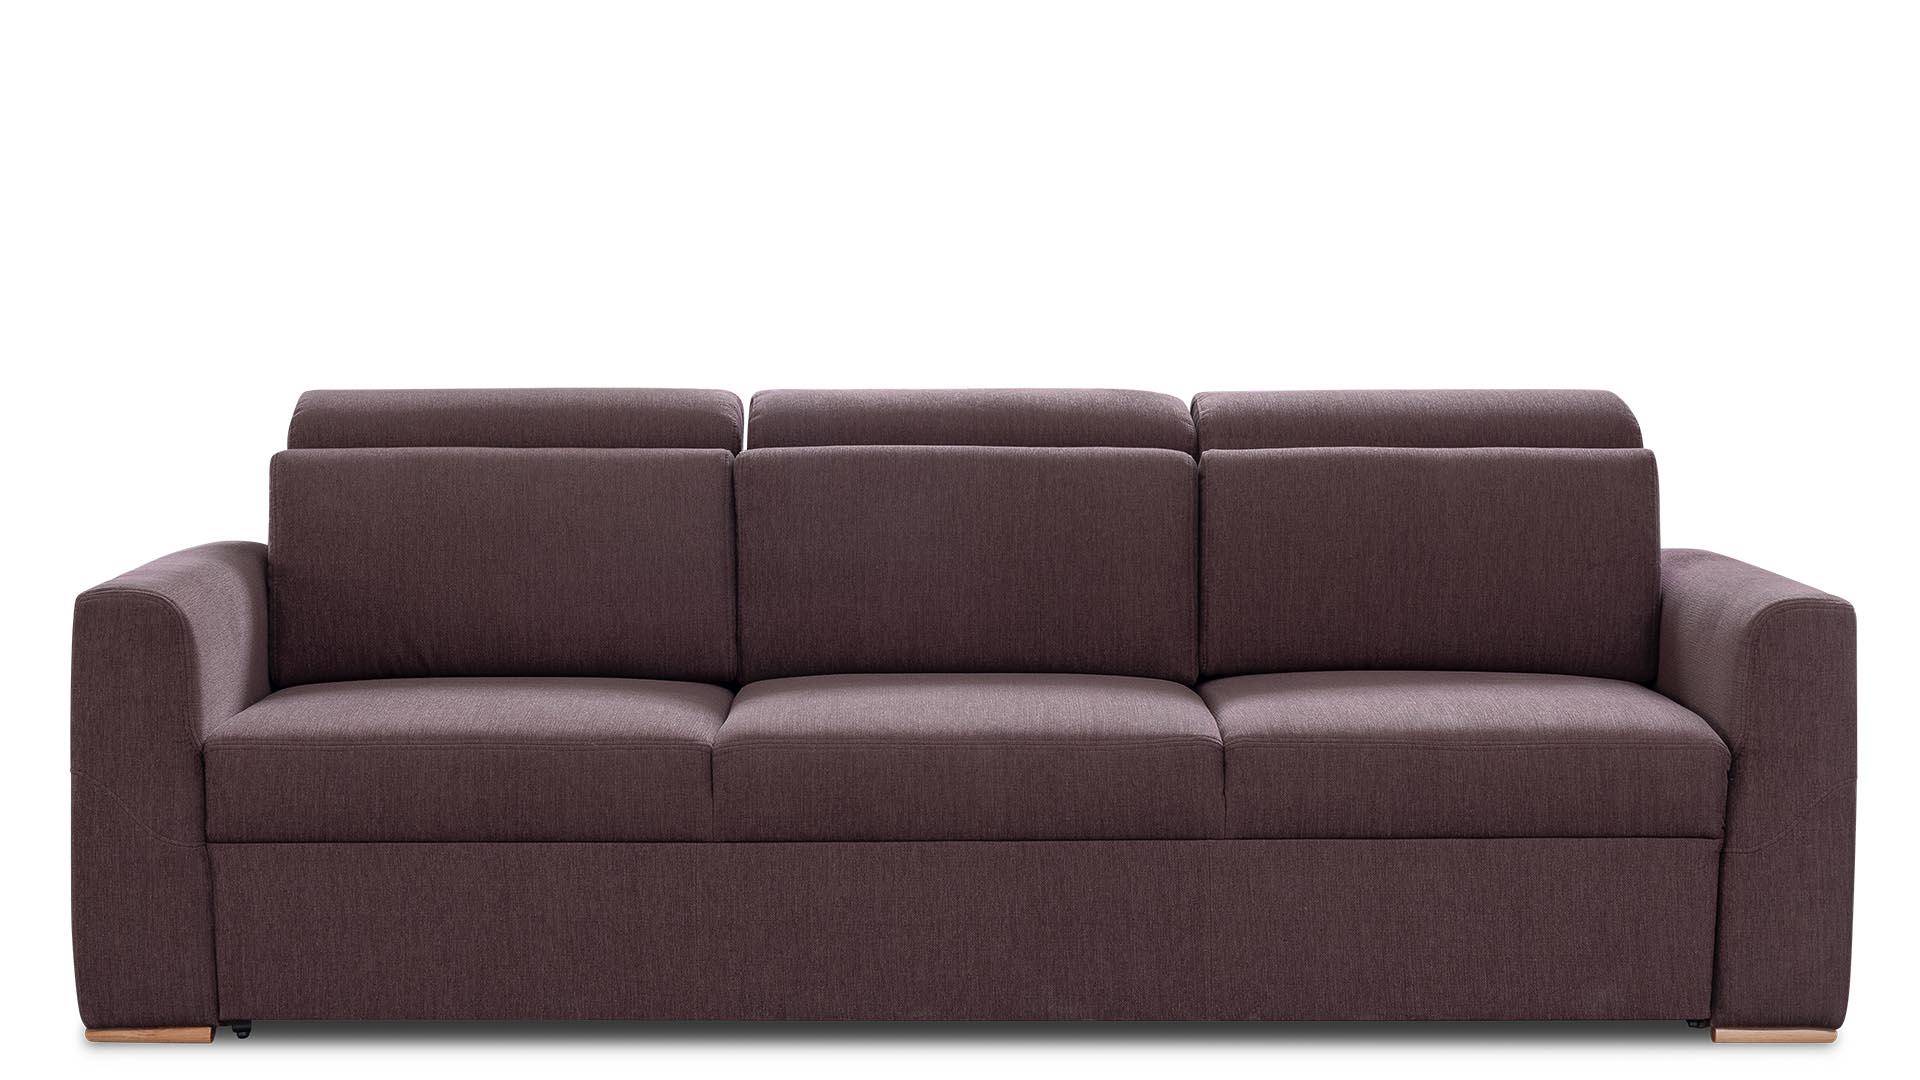 Sofa z funkcją spania Napp